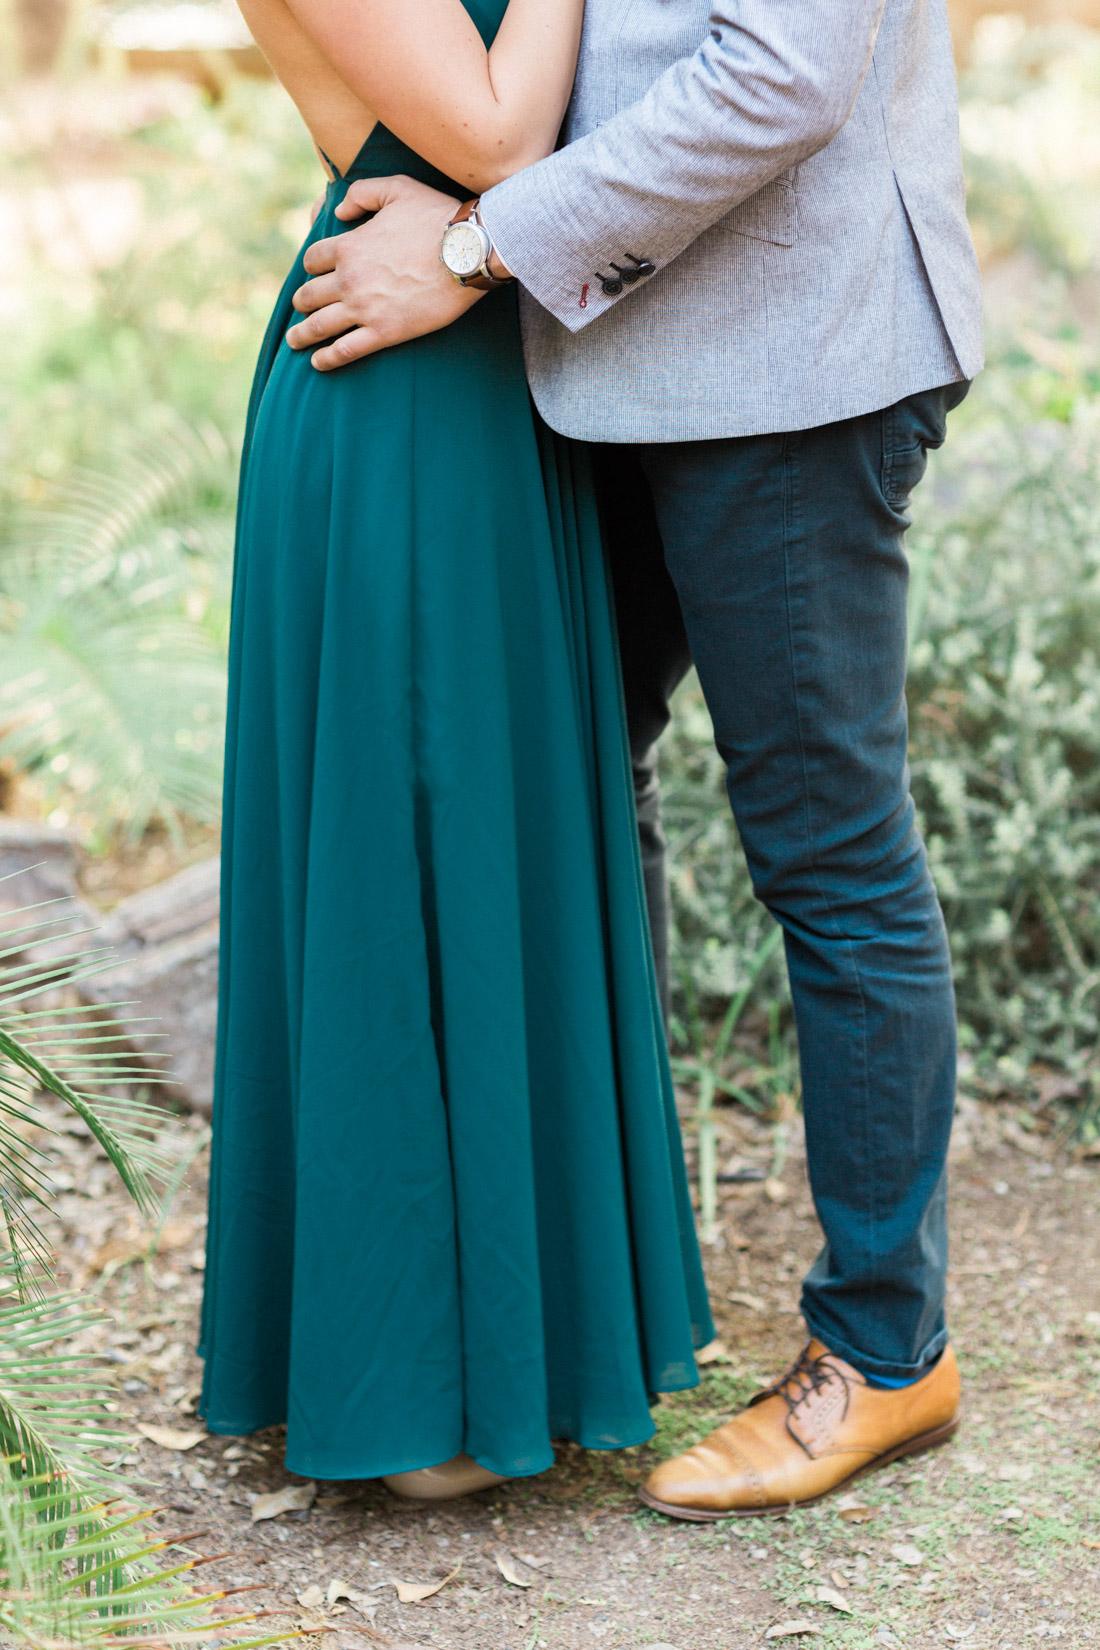 green-teal-dress.jpg